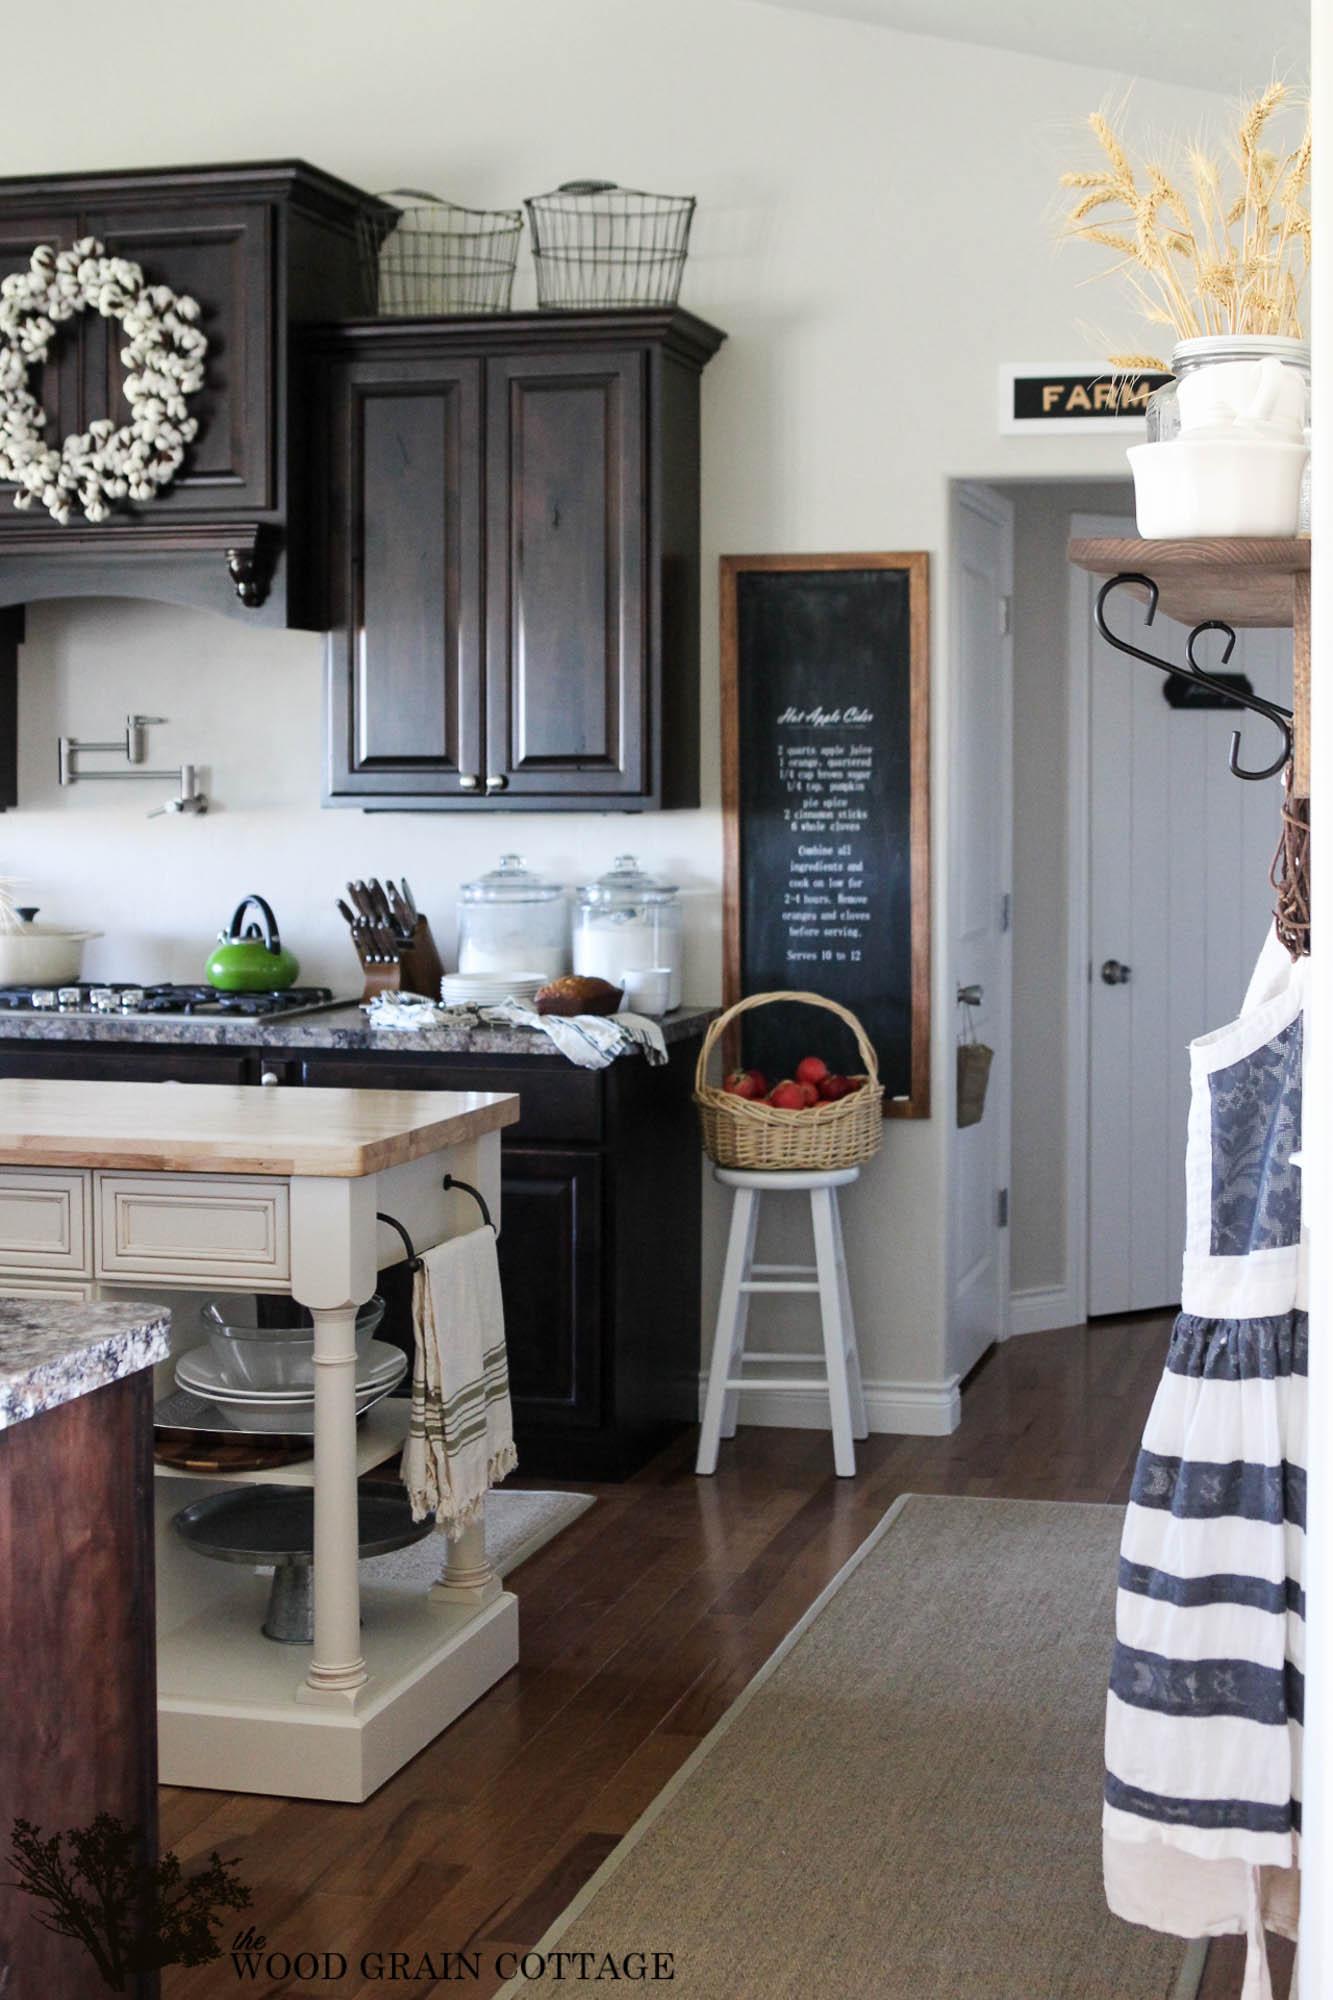 Stunning Cottage Kitchen {the Wood Grain Cottage}  The